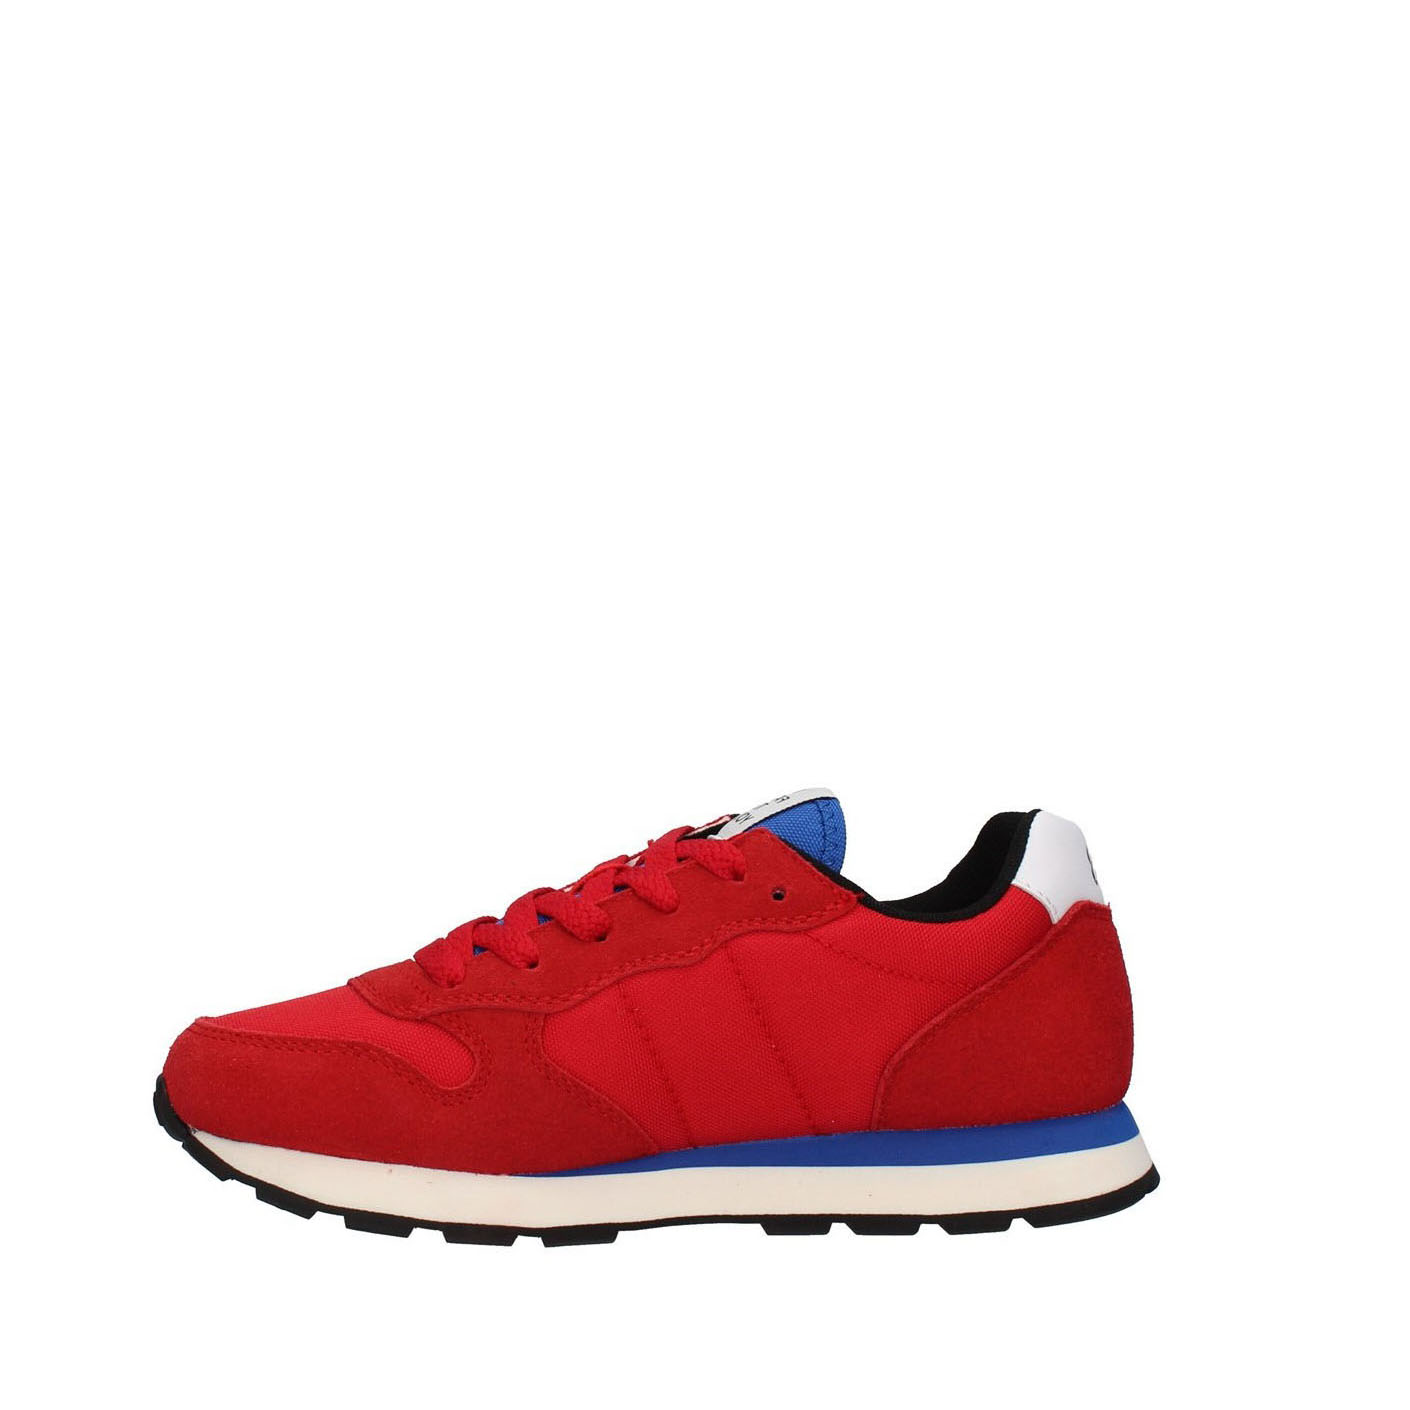 Sneakers Sun68 Boy's Tom Solid Nylon Rosso Z41301 10ROSSO -A.1